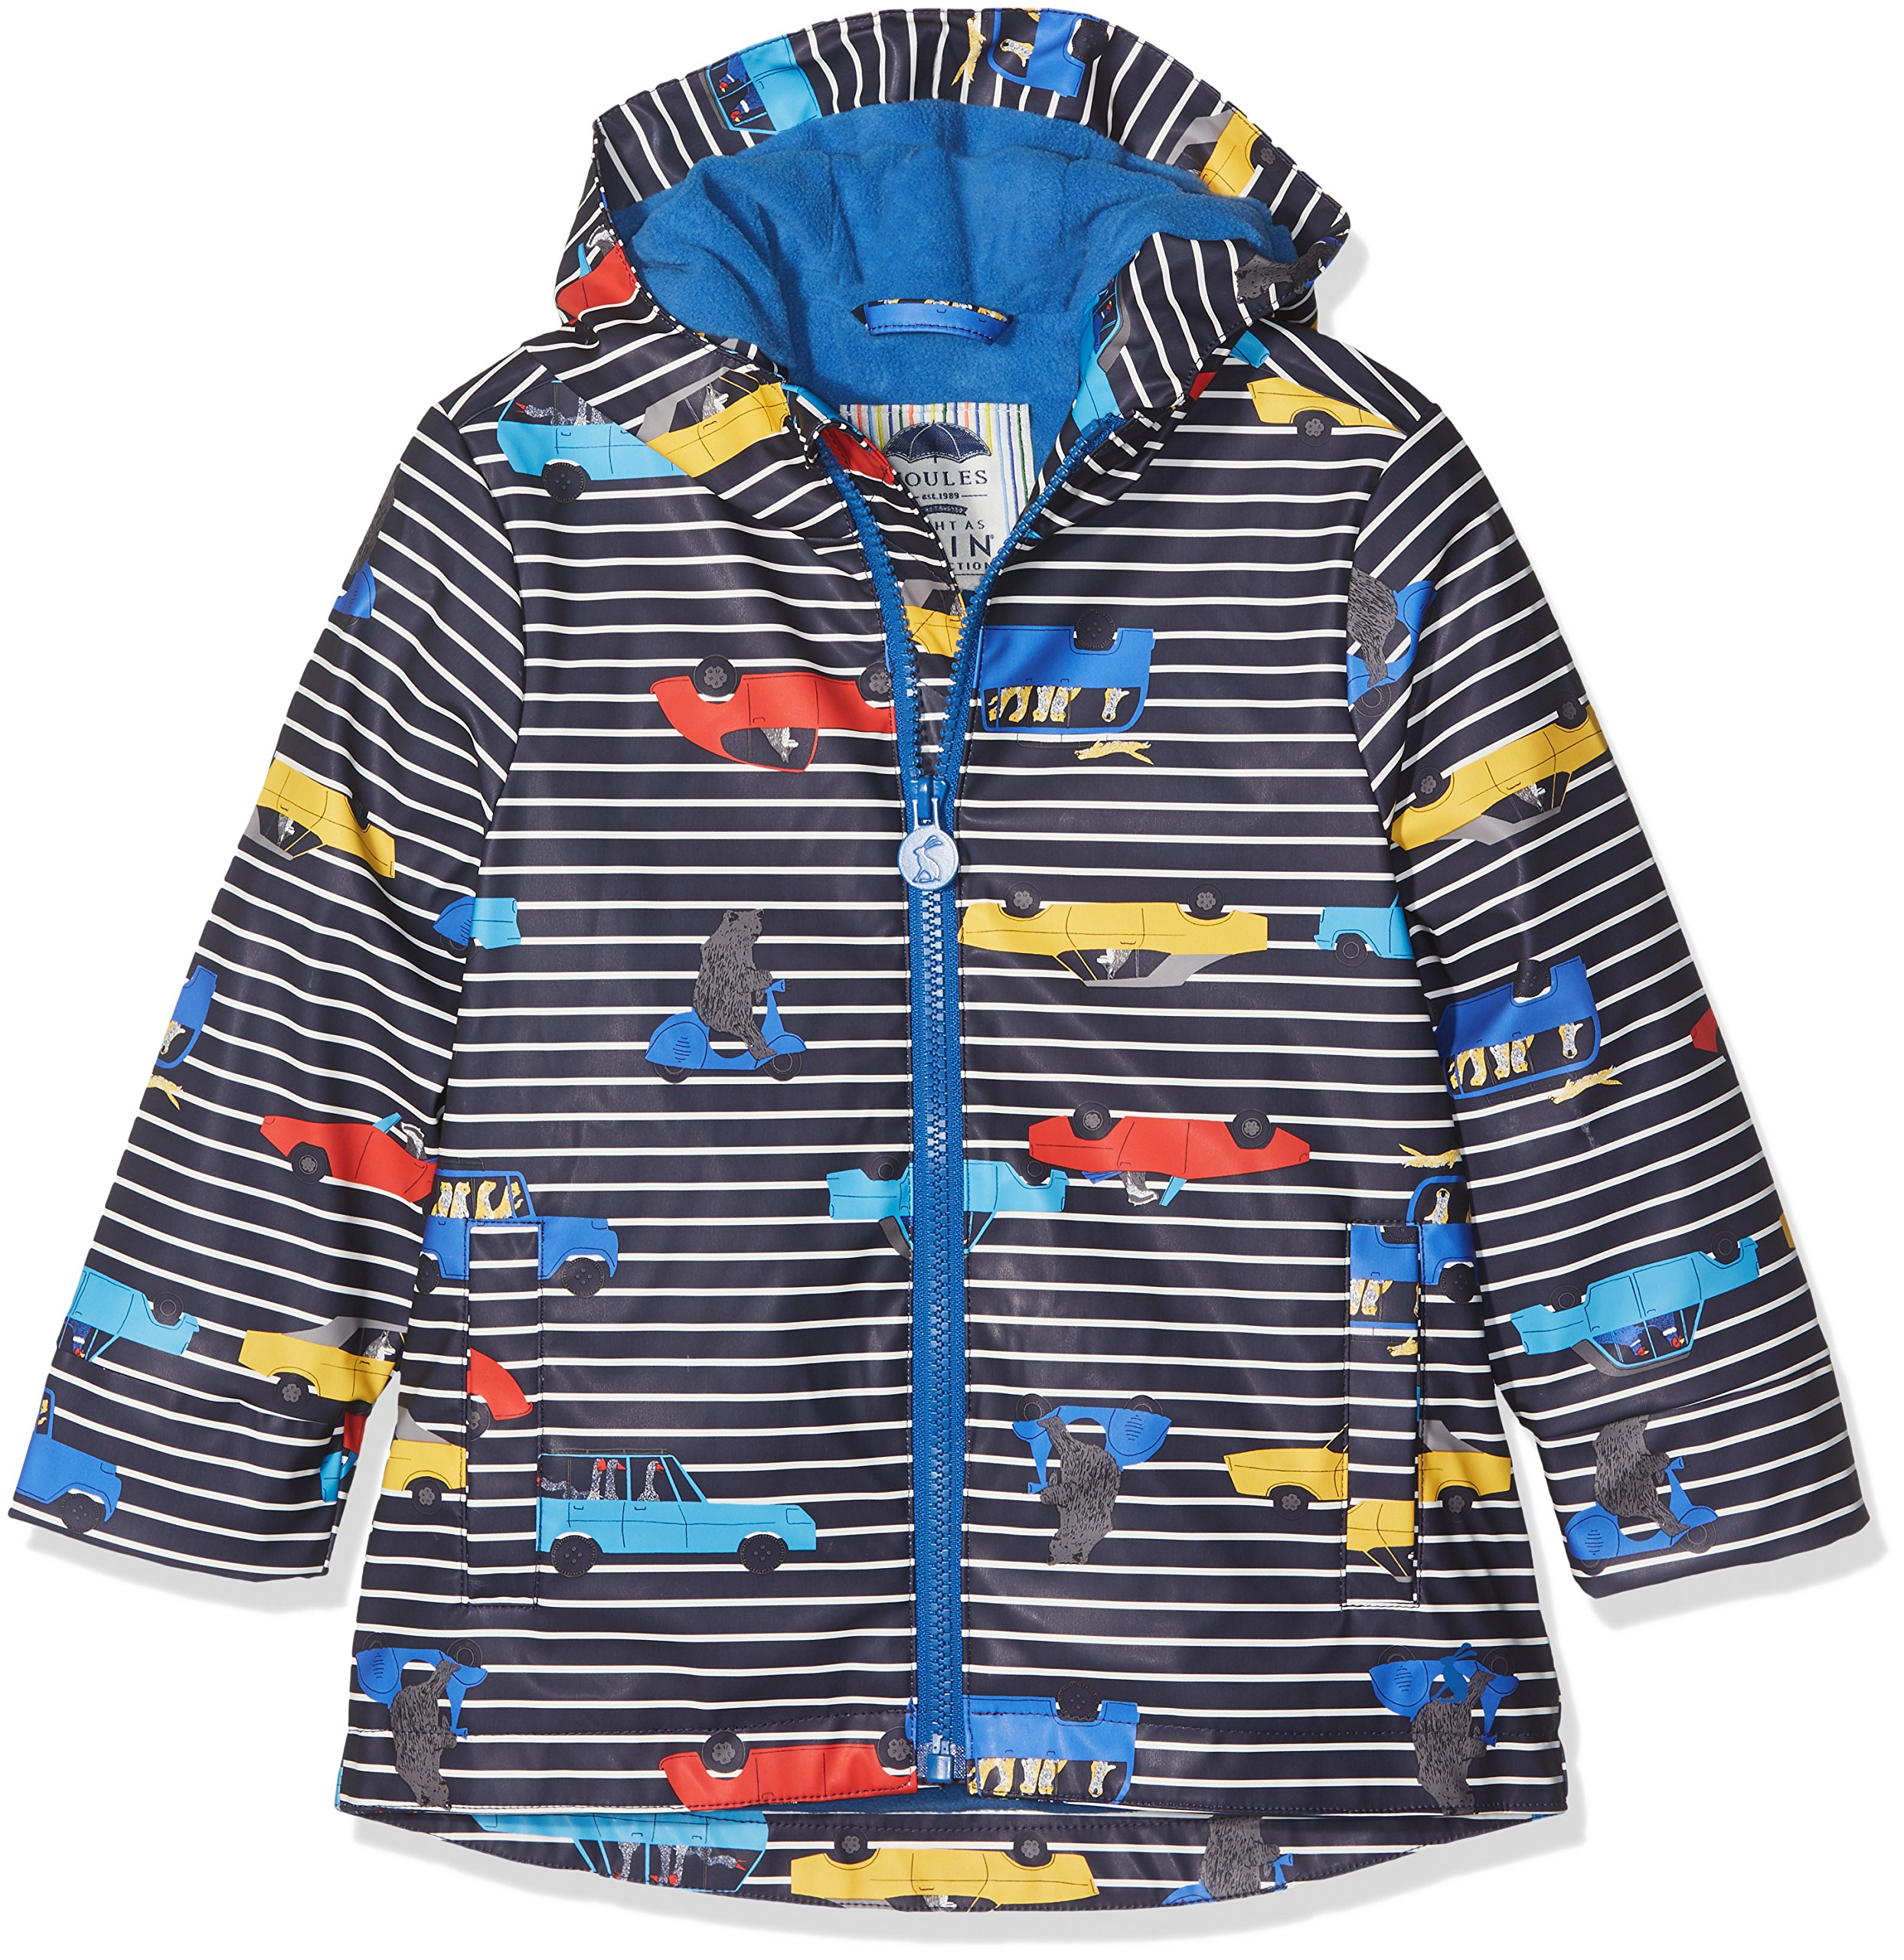 Joules Little Boys' Skipper Rubber Rain Coat, Navy Stripe Cars 6